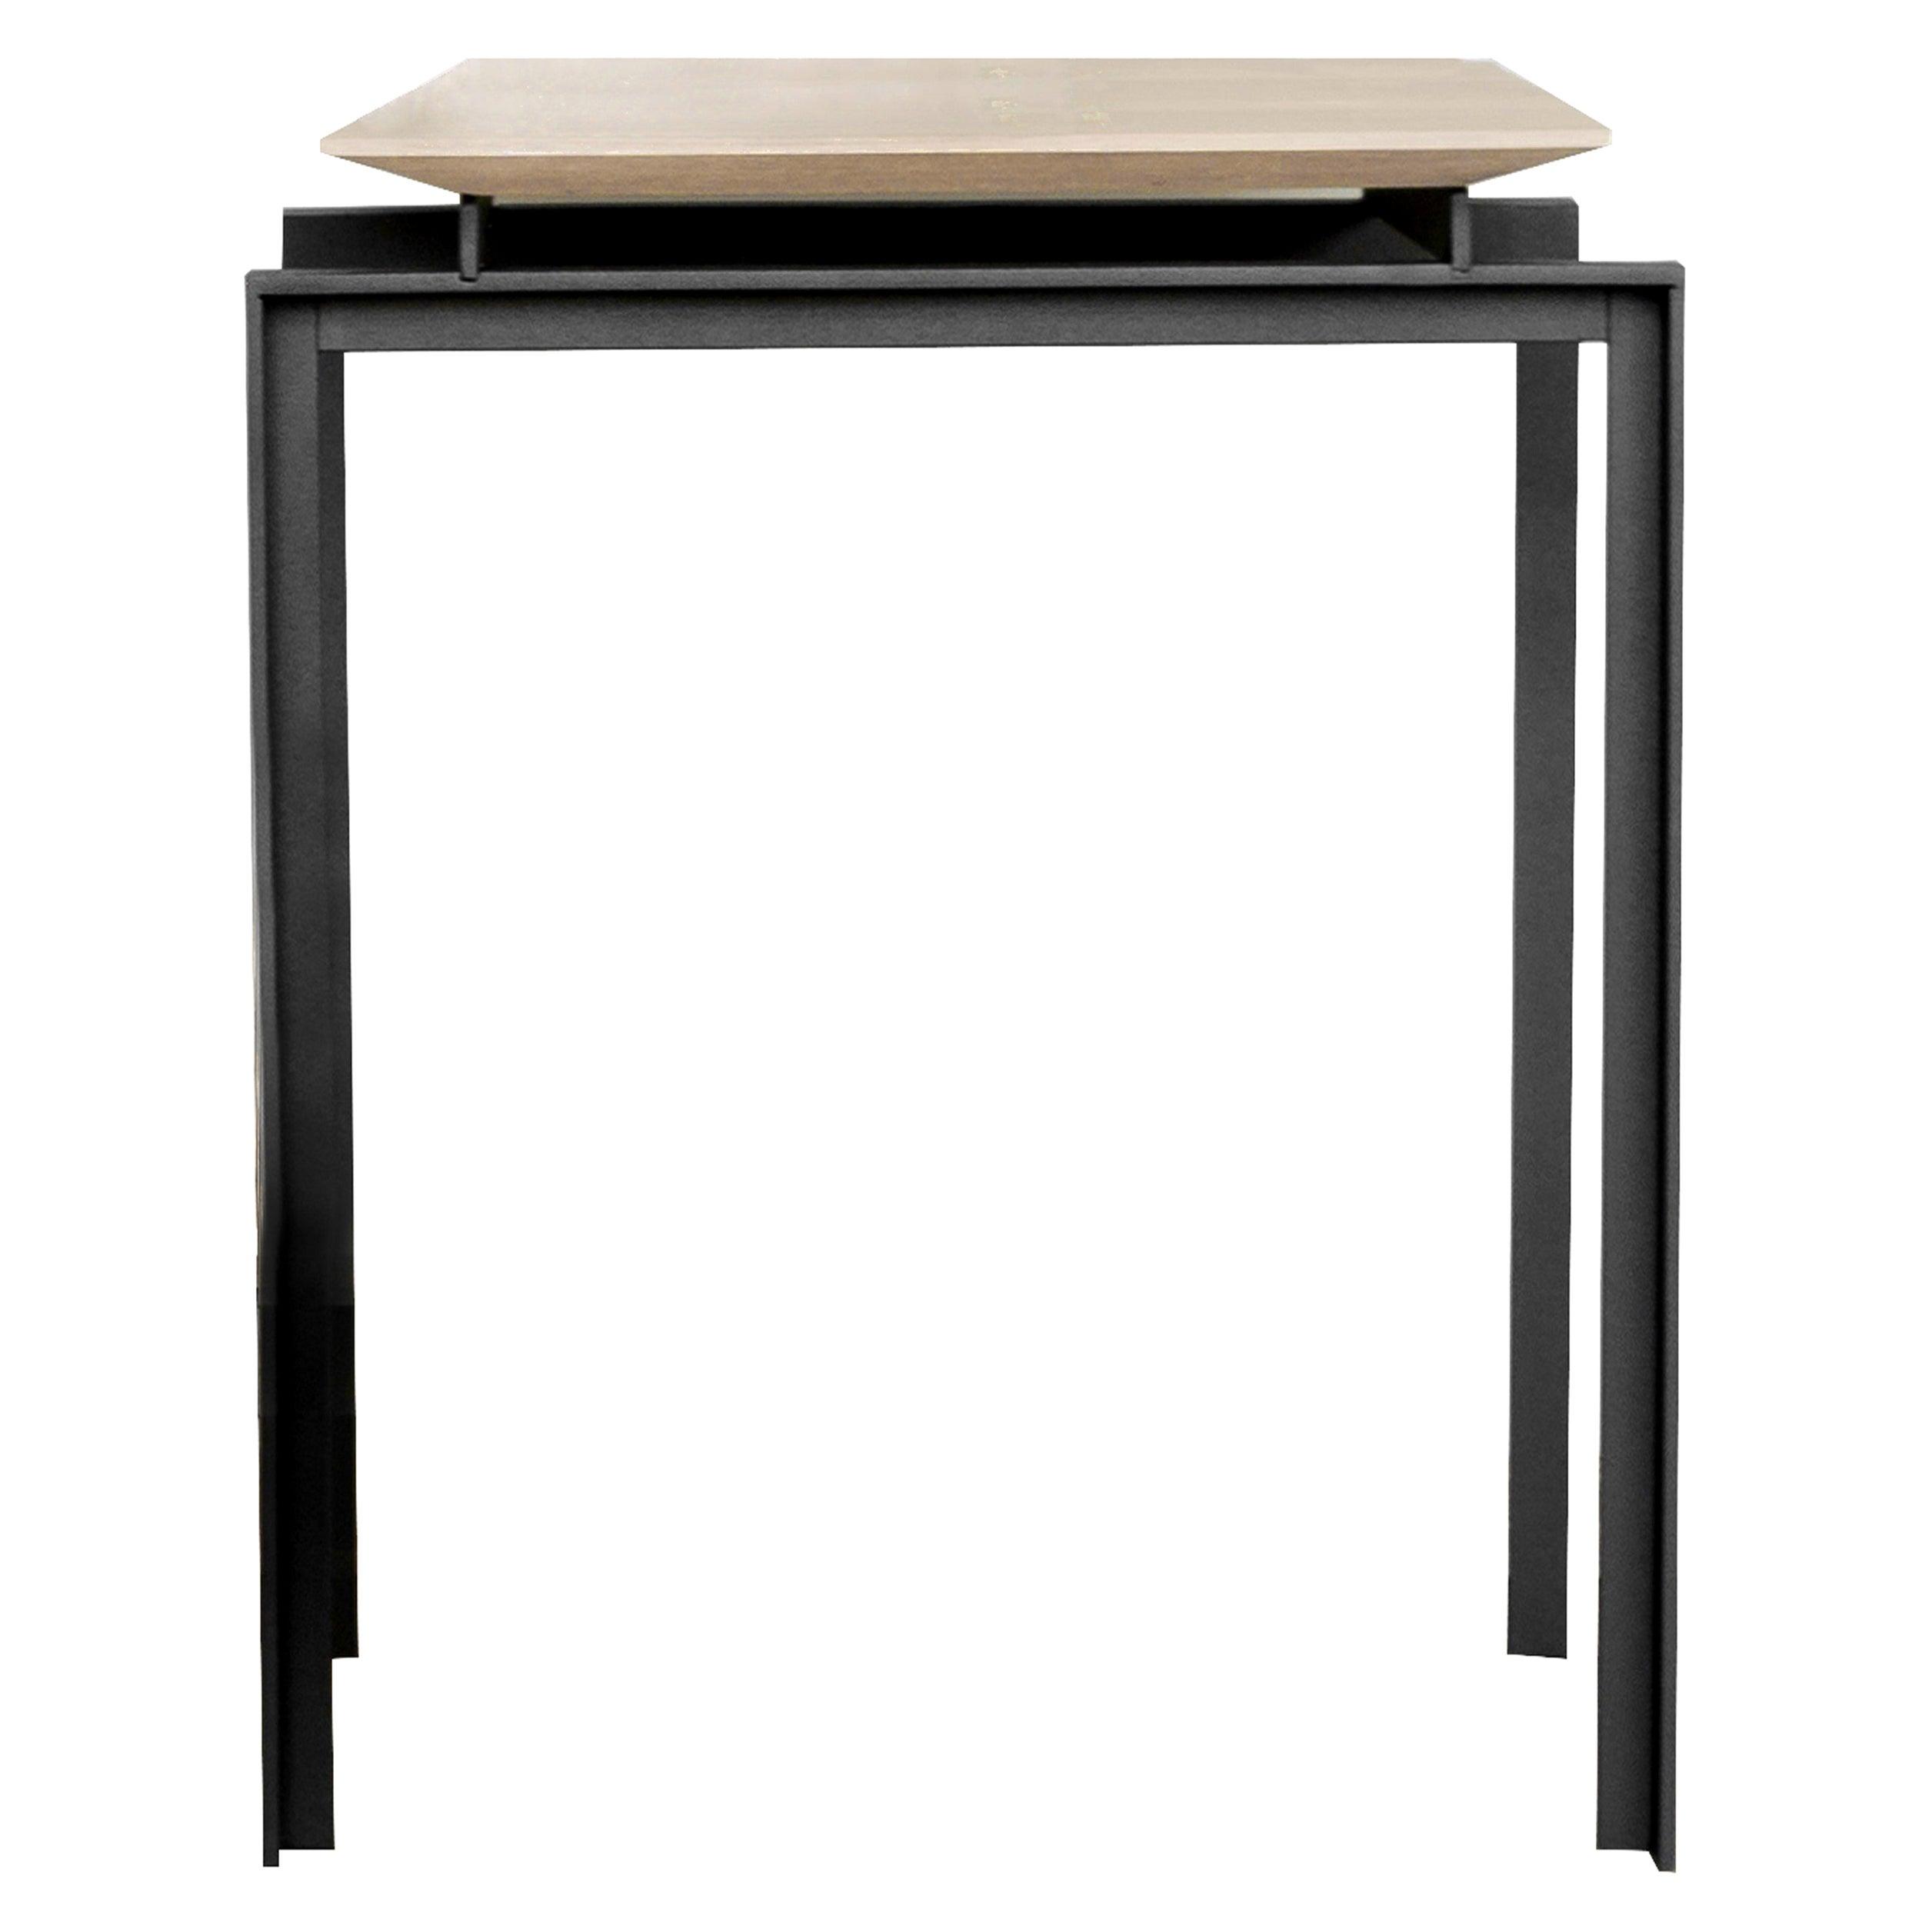 Ala White Oak Veneer Top on Metal Structure Side Table